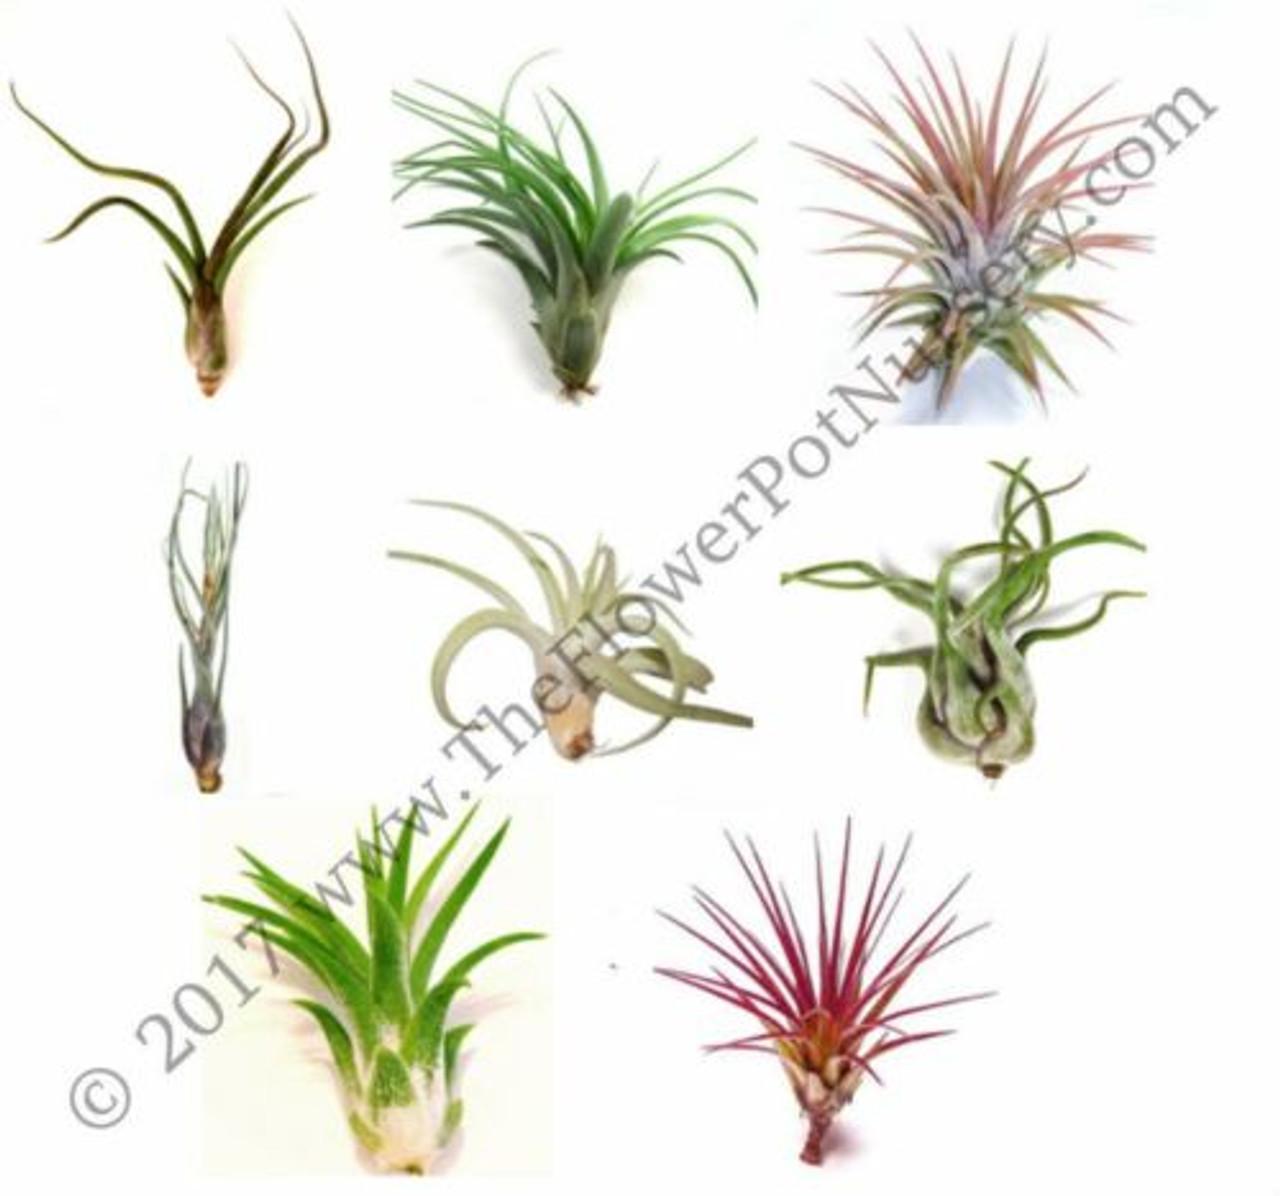 Lot Of 10 Air Plants Tillandsia Spp Extra Large Premium